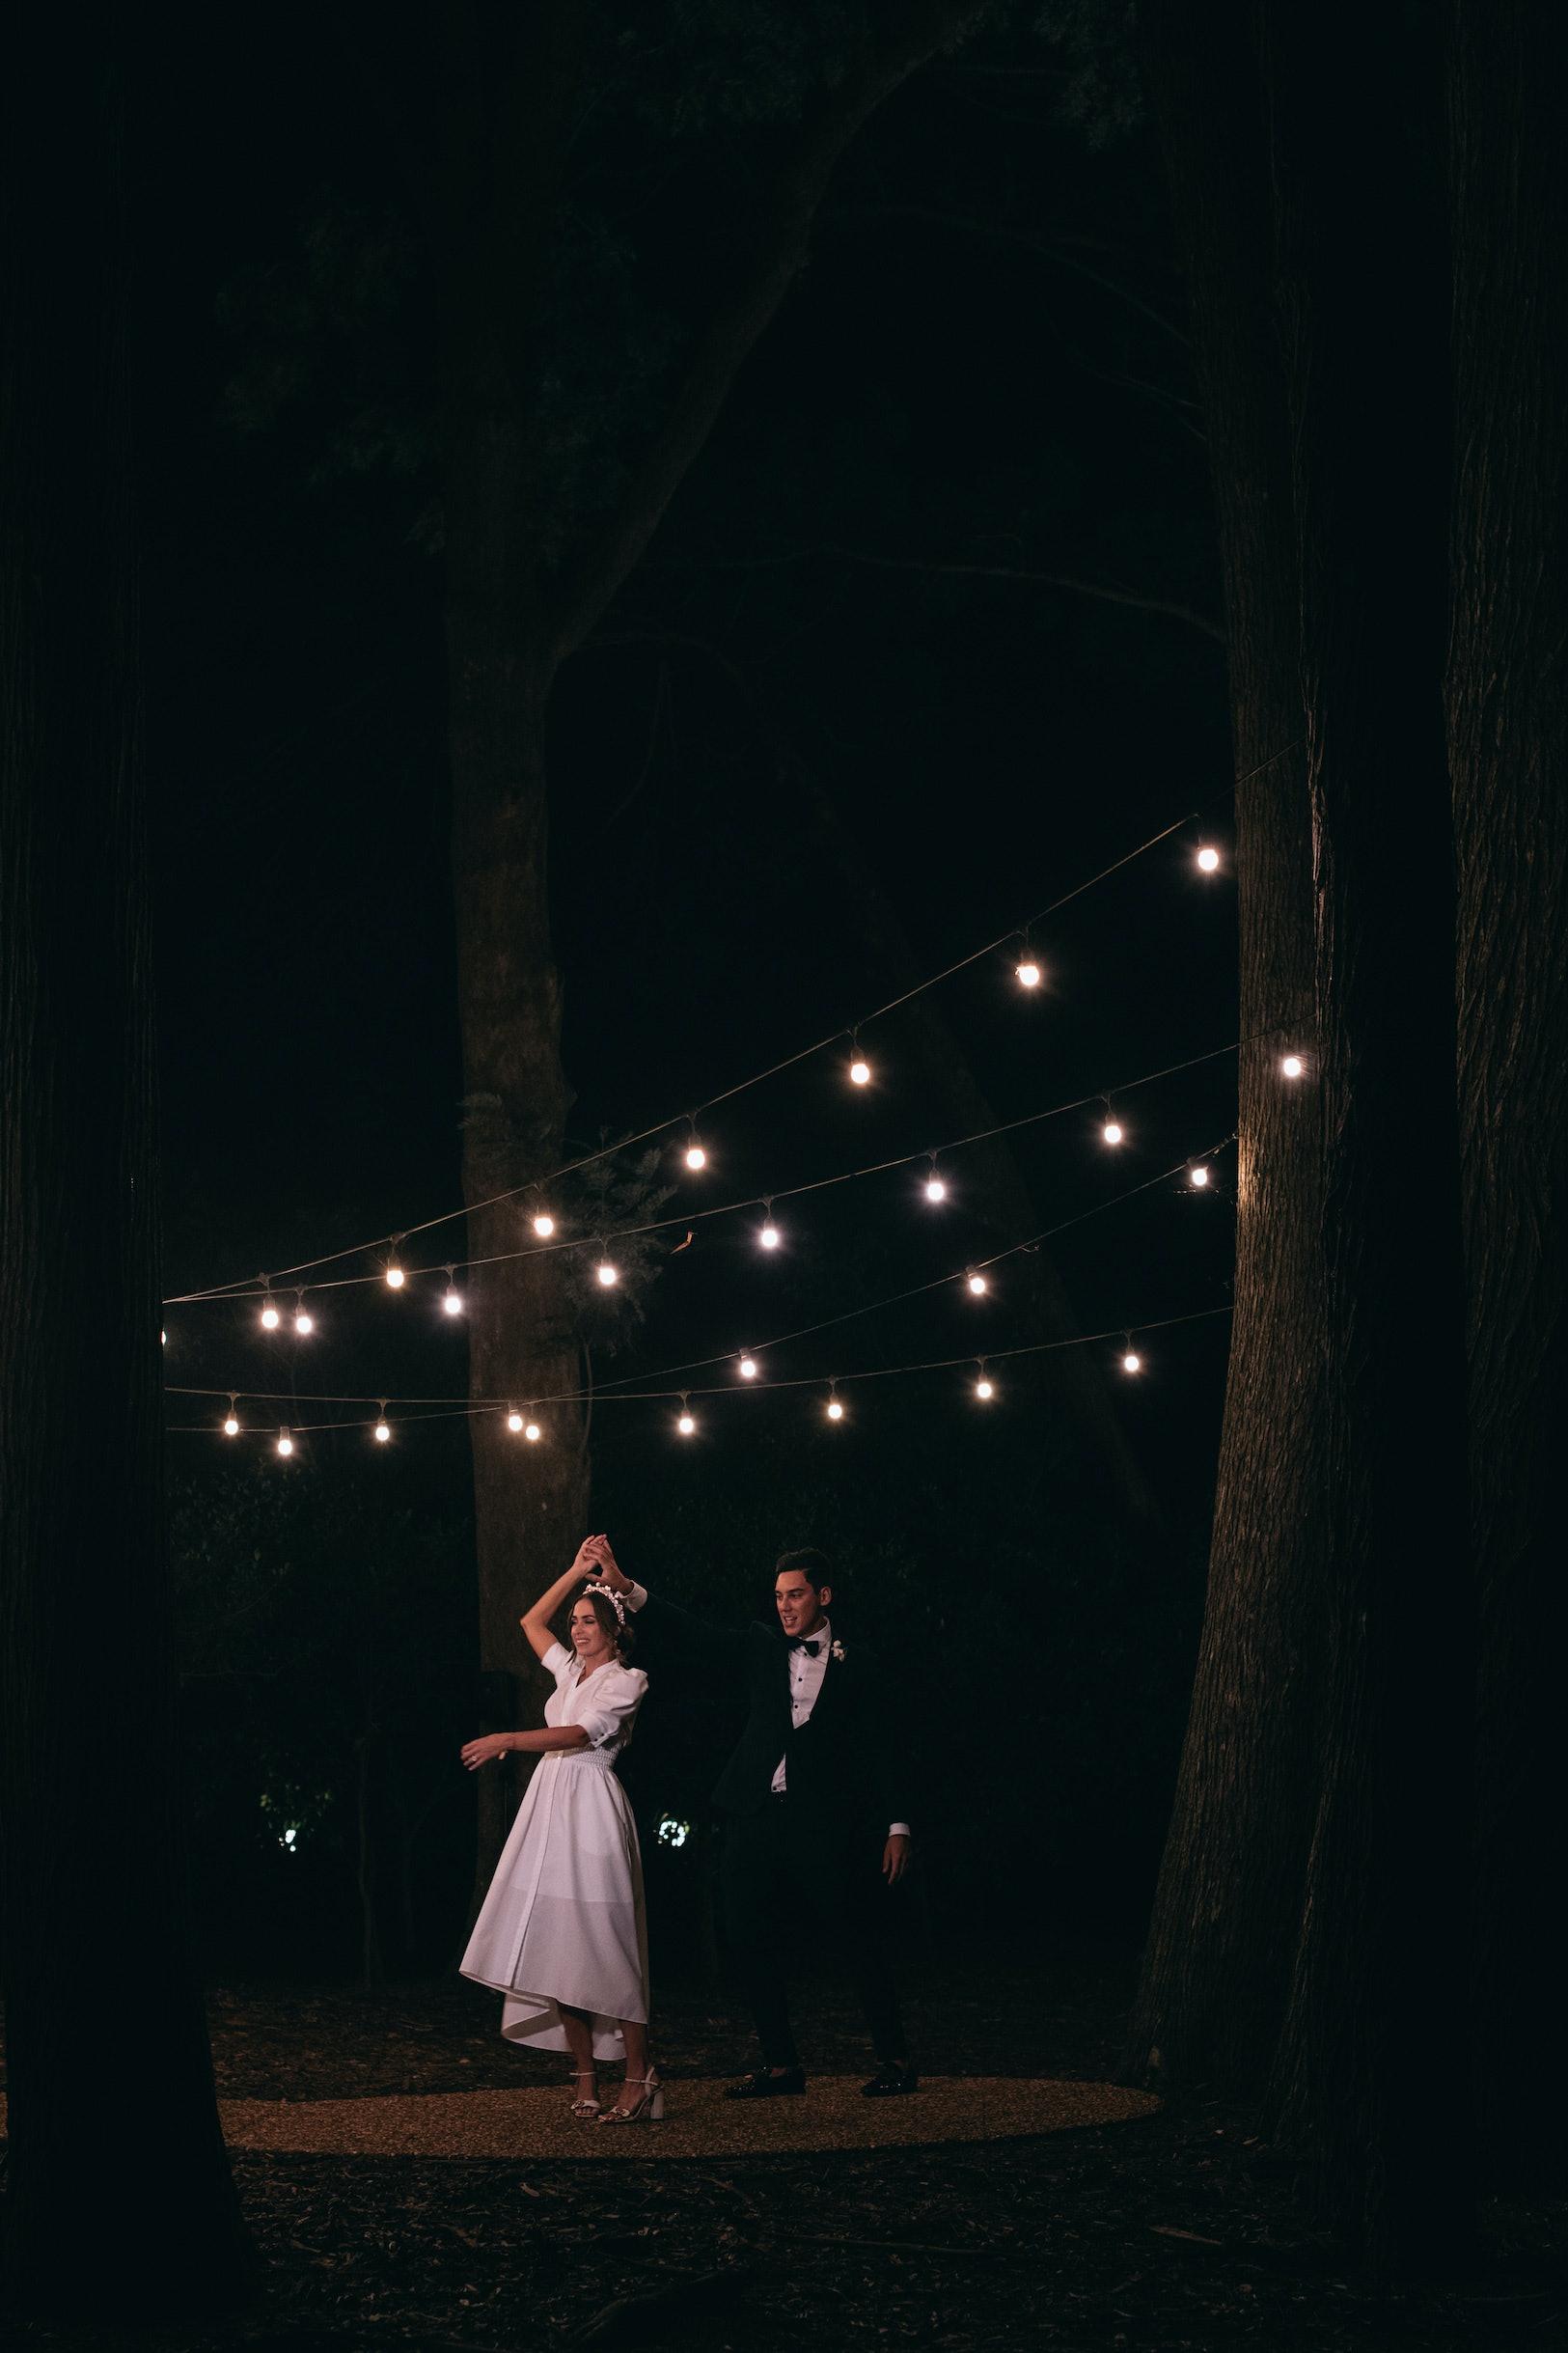 Bride and groom dancing outside